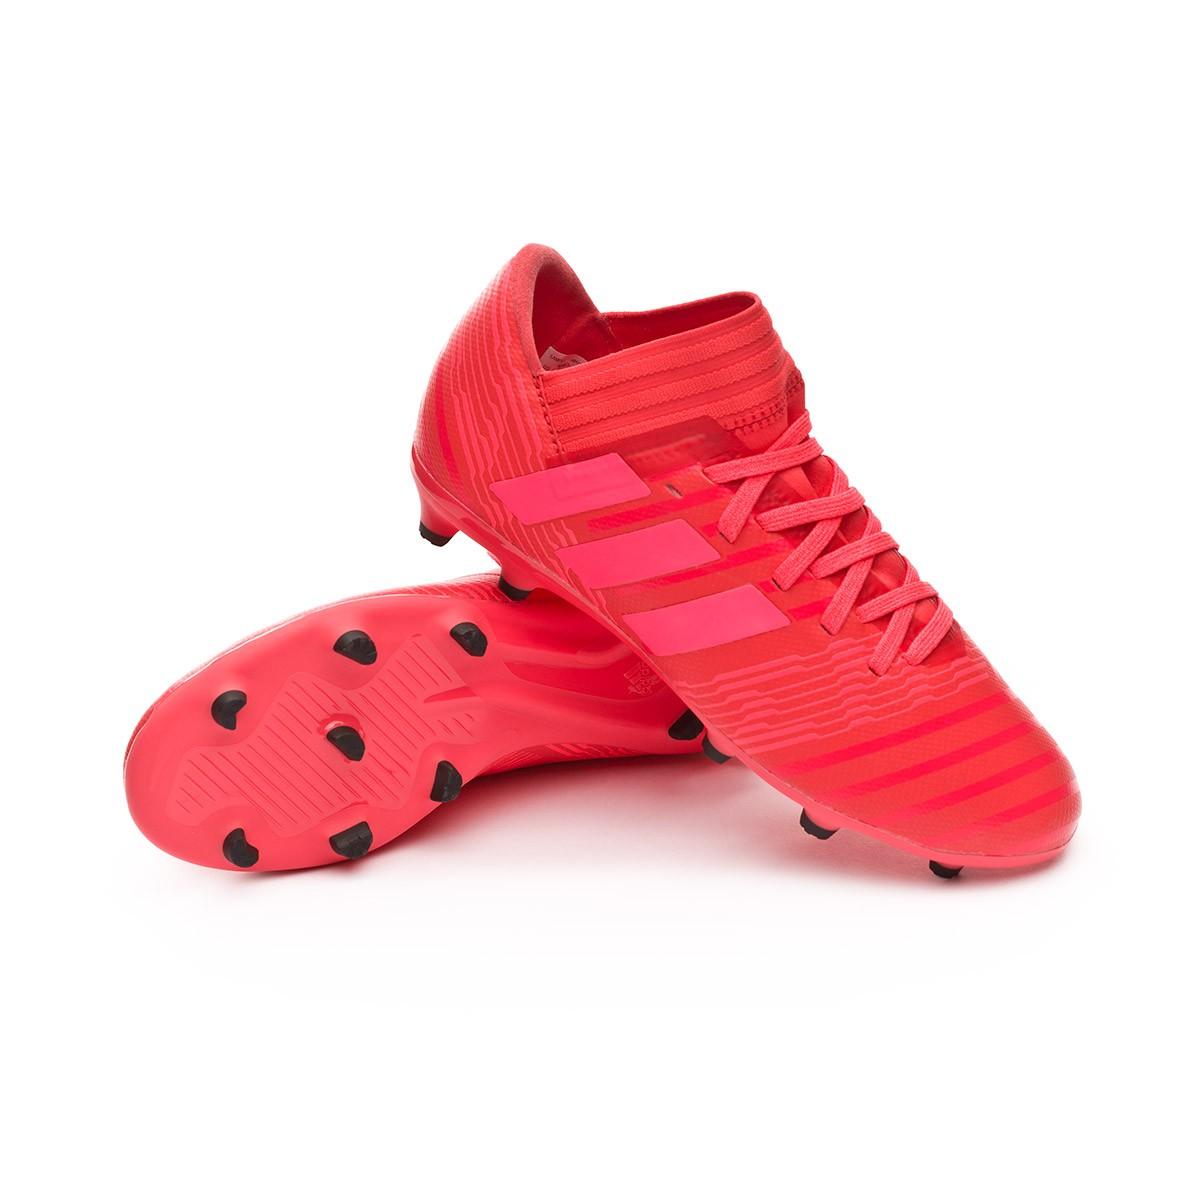 Boot adidas Kids Nemeziz 17.3 FG Real coral-Red zest-Core black ... eeca5e70c